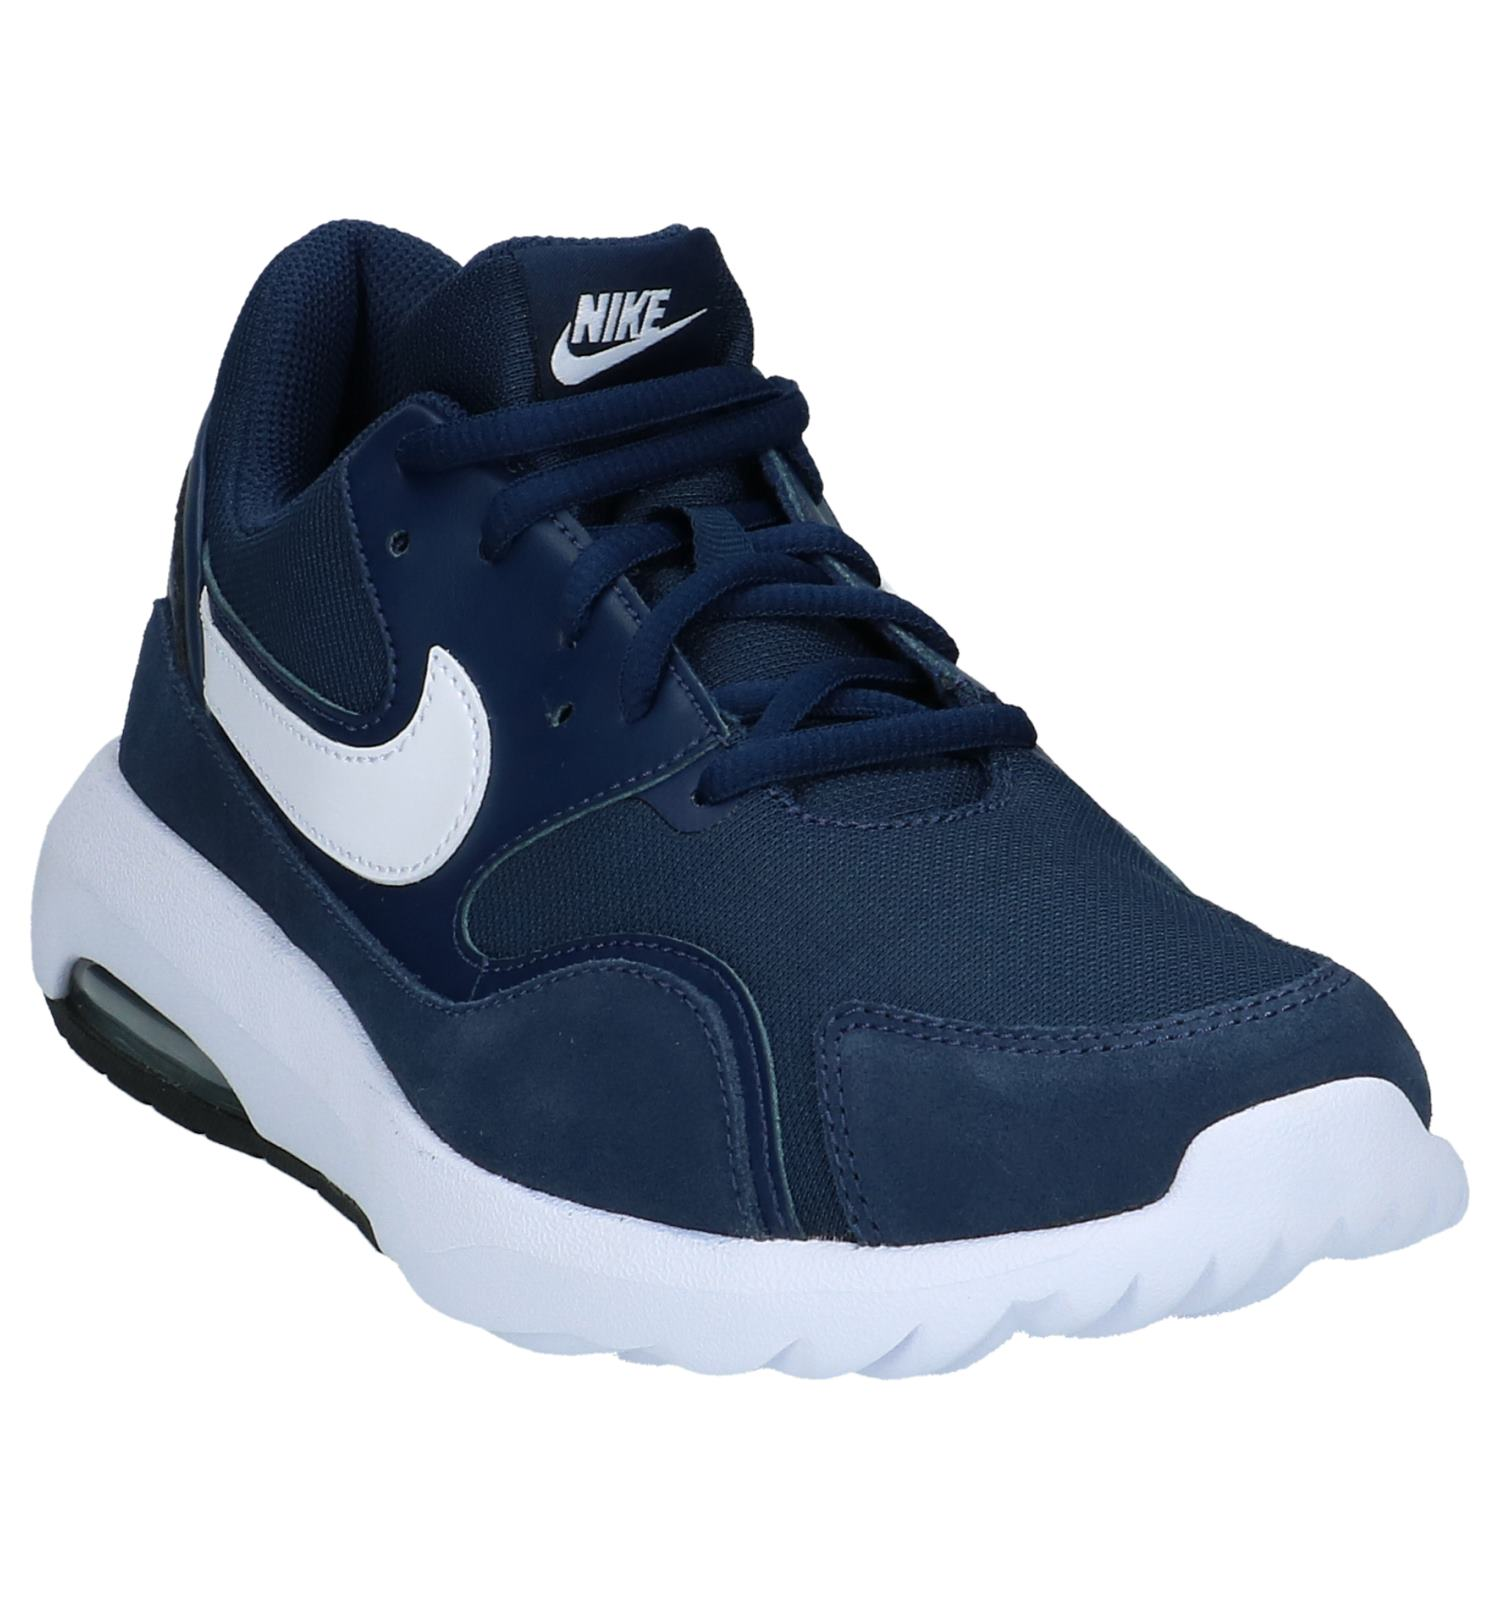 outlet store 30a72 70d8a Donker Blauwe Nike Air Max Nostalgic Sneakers  TORFS.BE  Gratis verzend  en retour